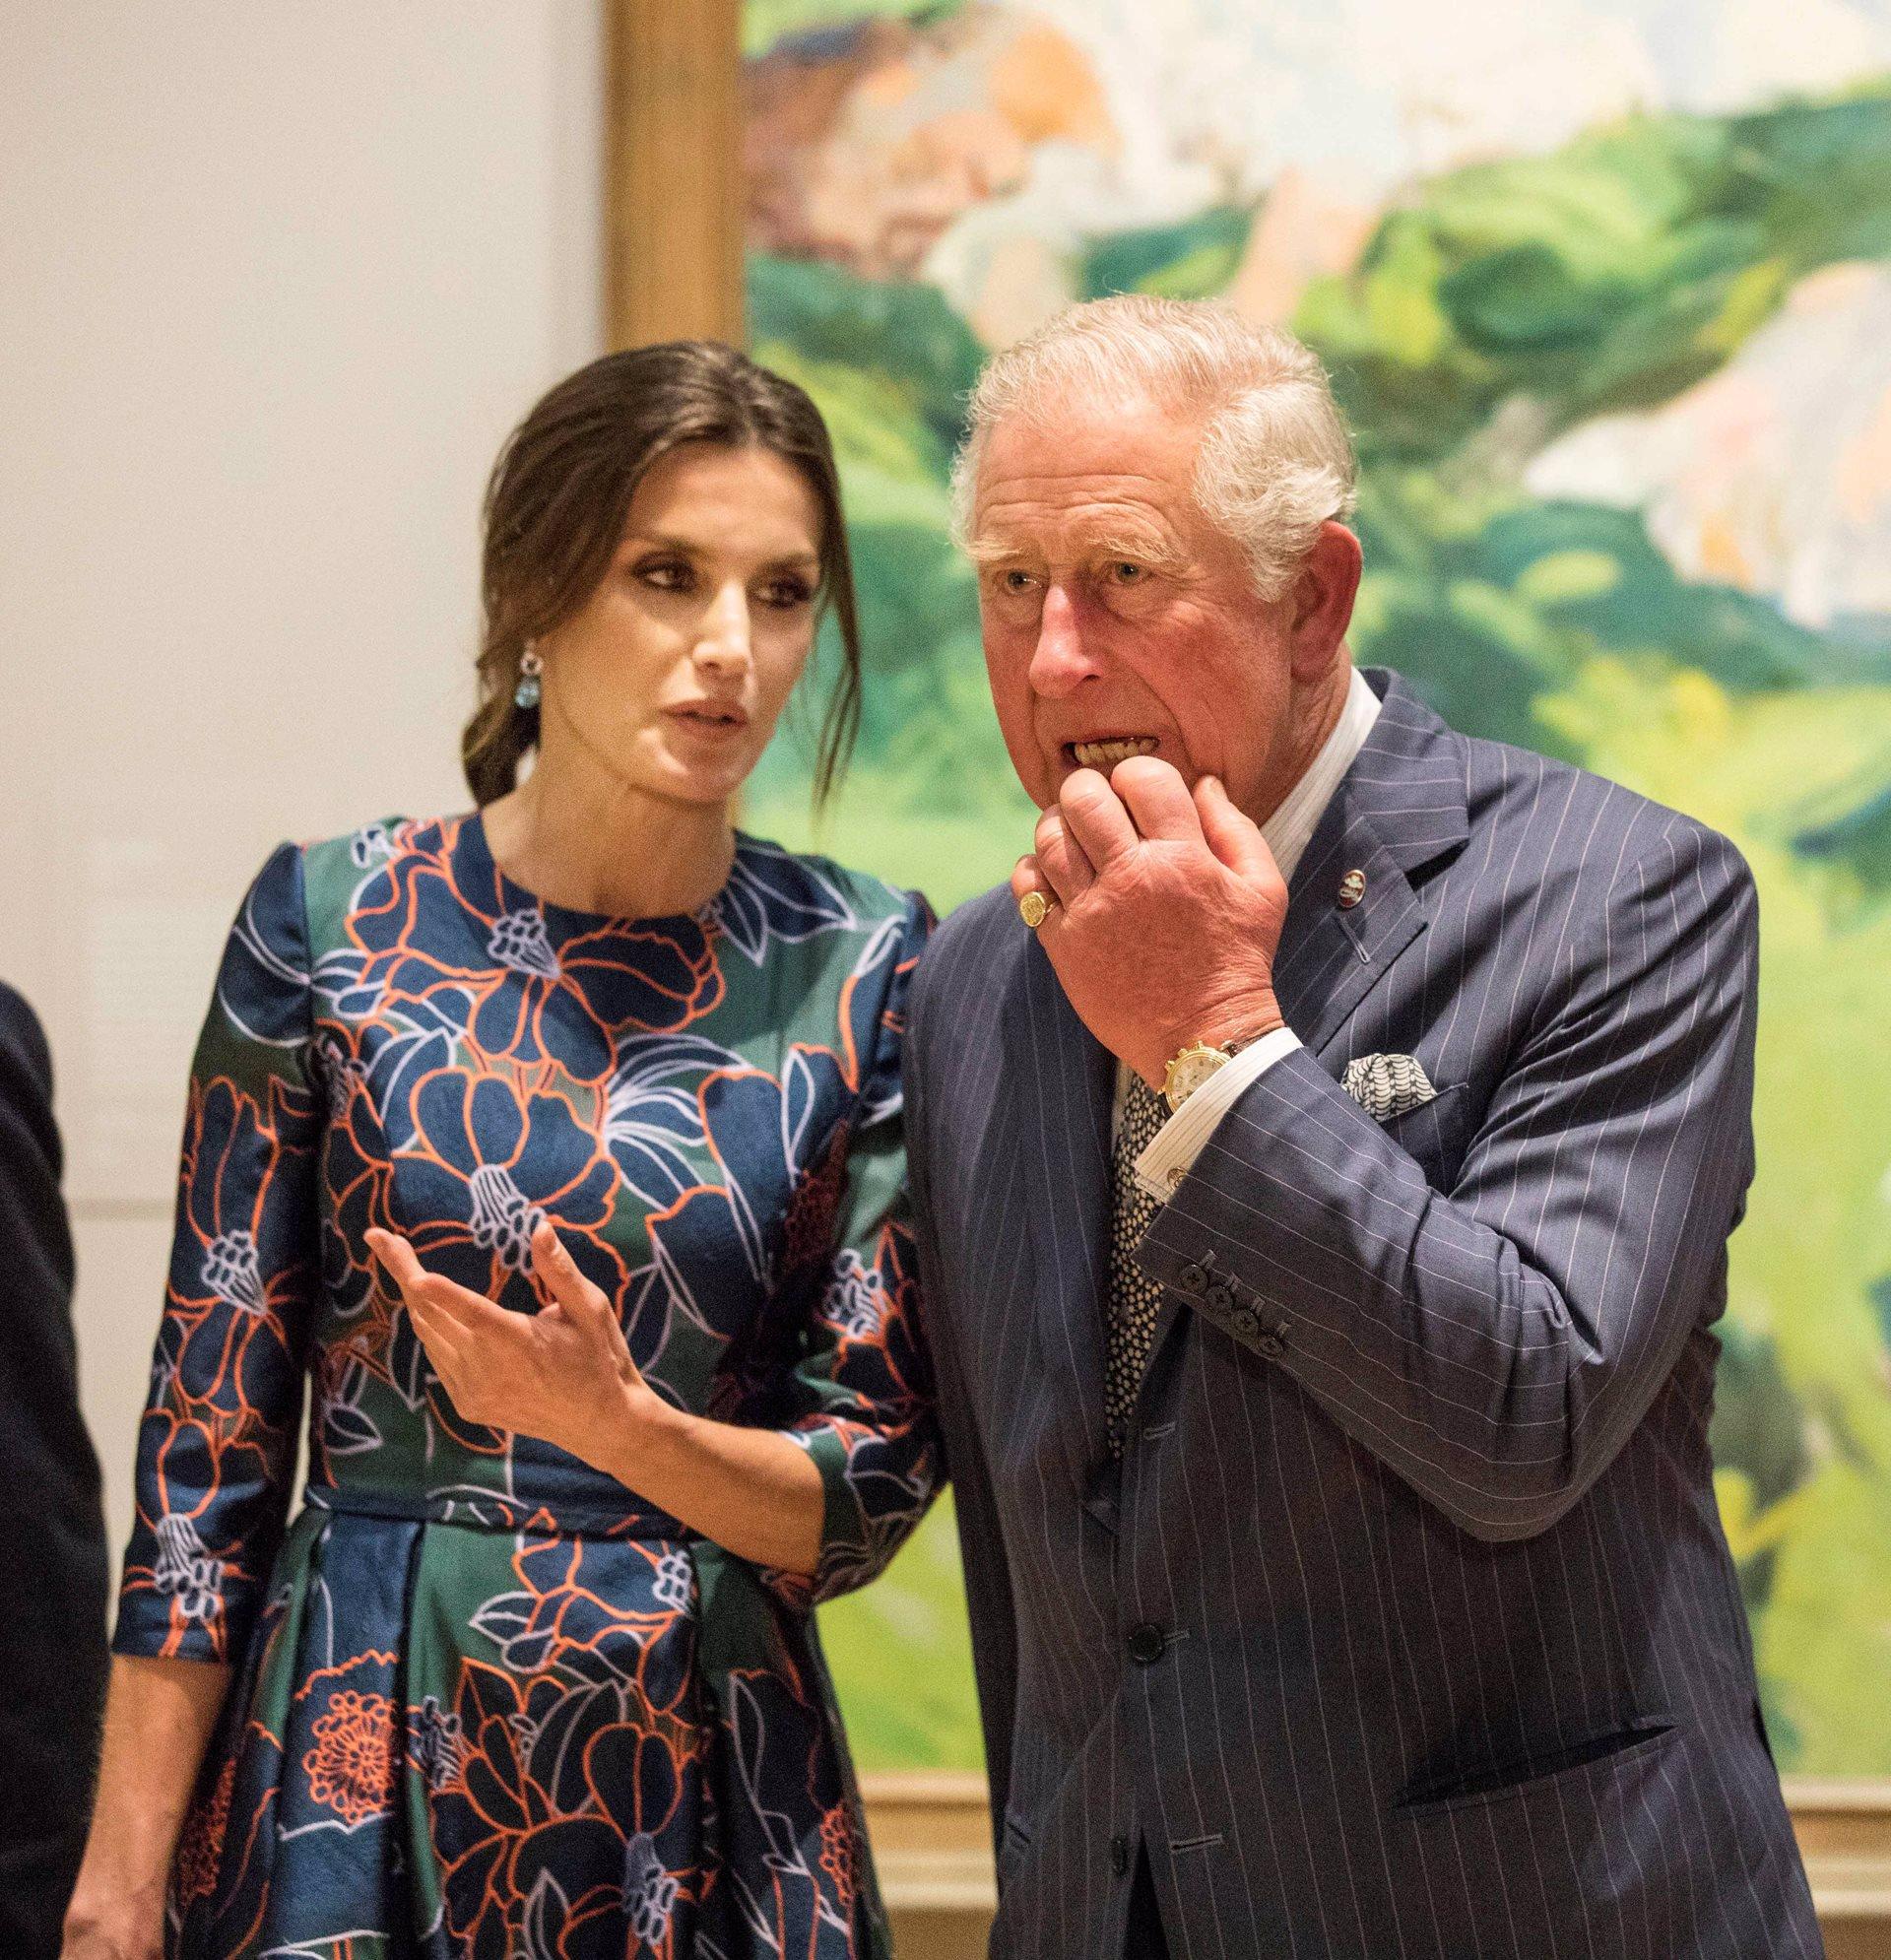 La Reina Letizia comenta al Principe Carlos la obra de Joaquín Sorolla